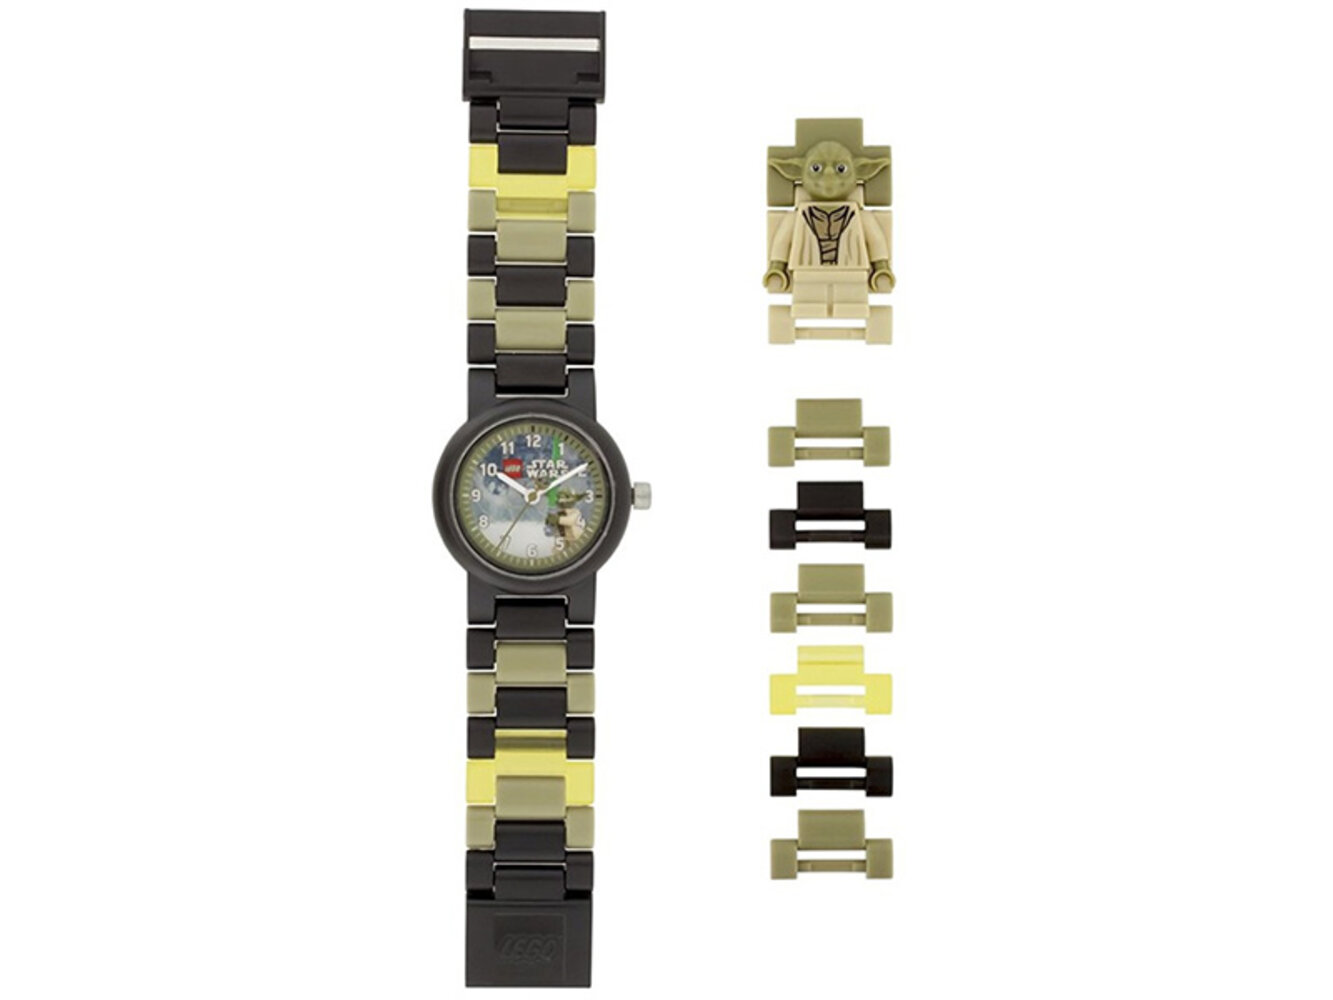 Yoda Buildable Watch